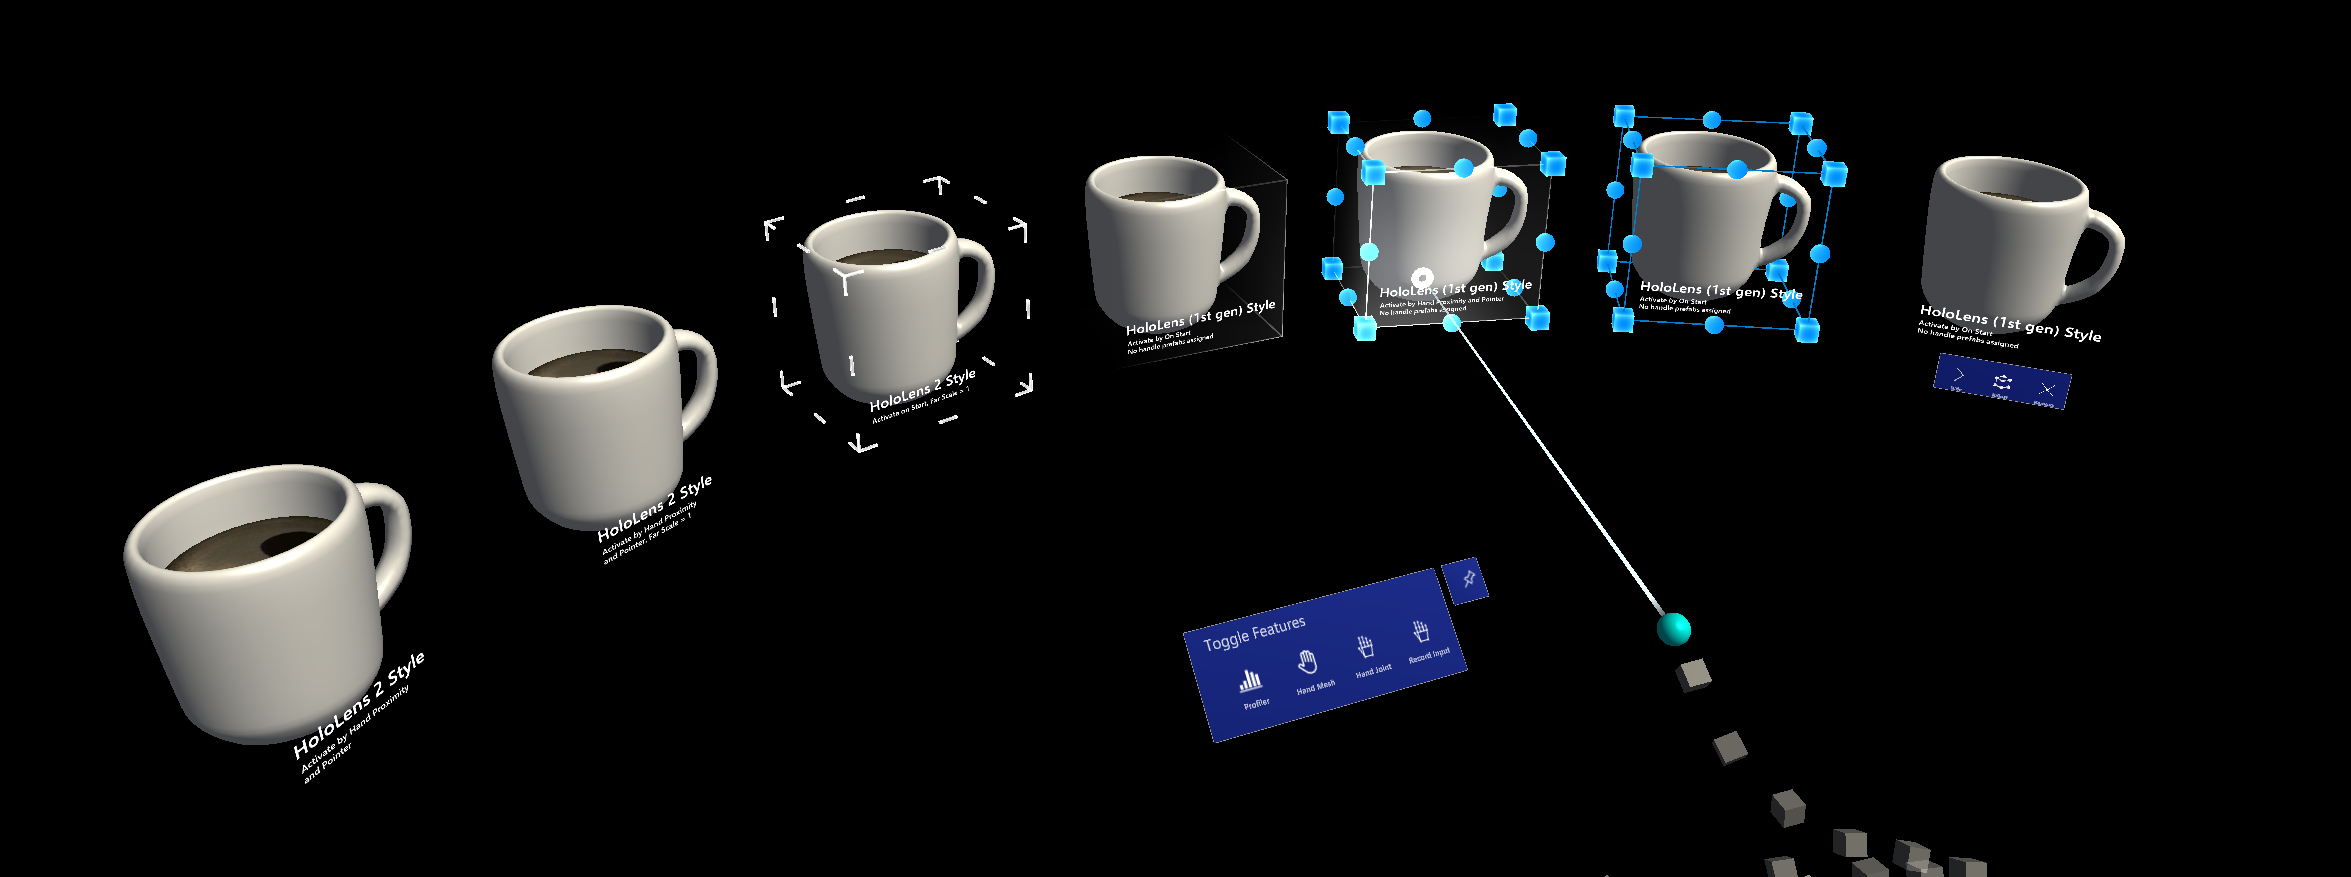 Bounding box | Mixed Reality Toolkit Documentation